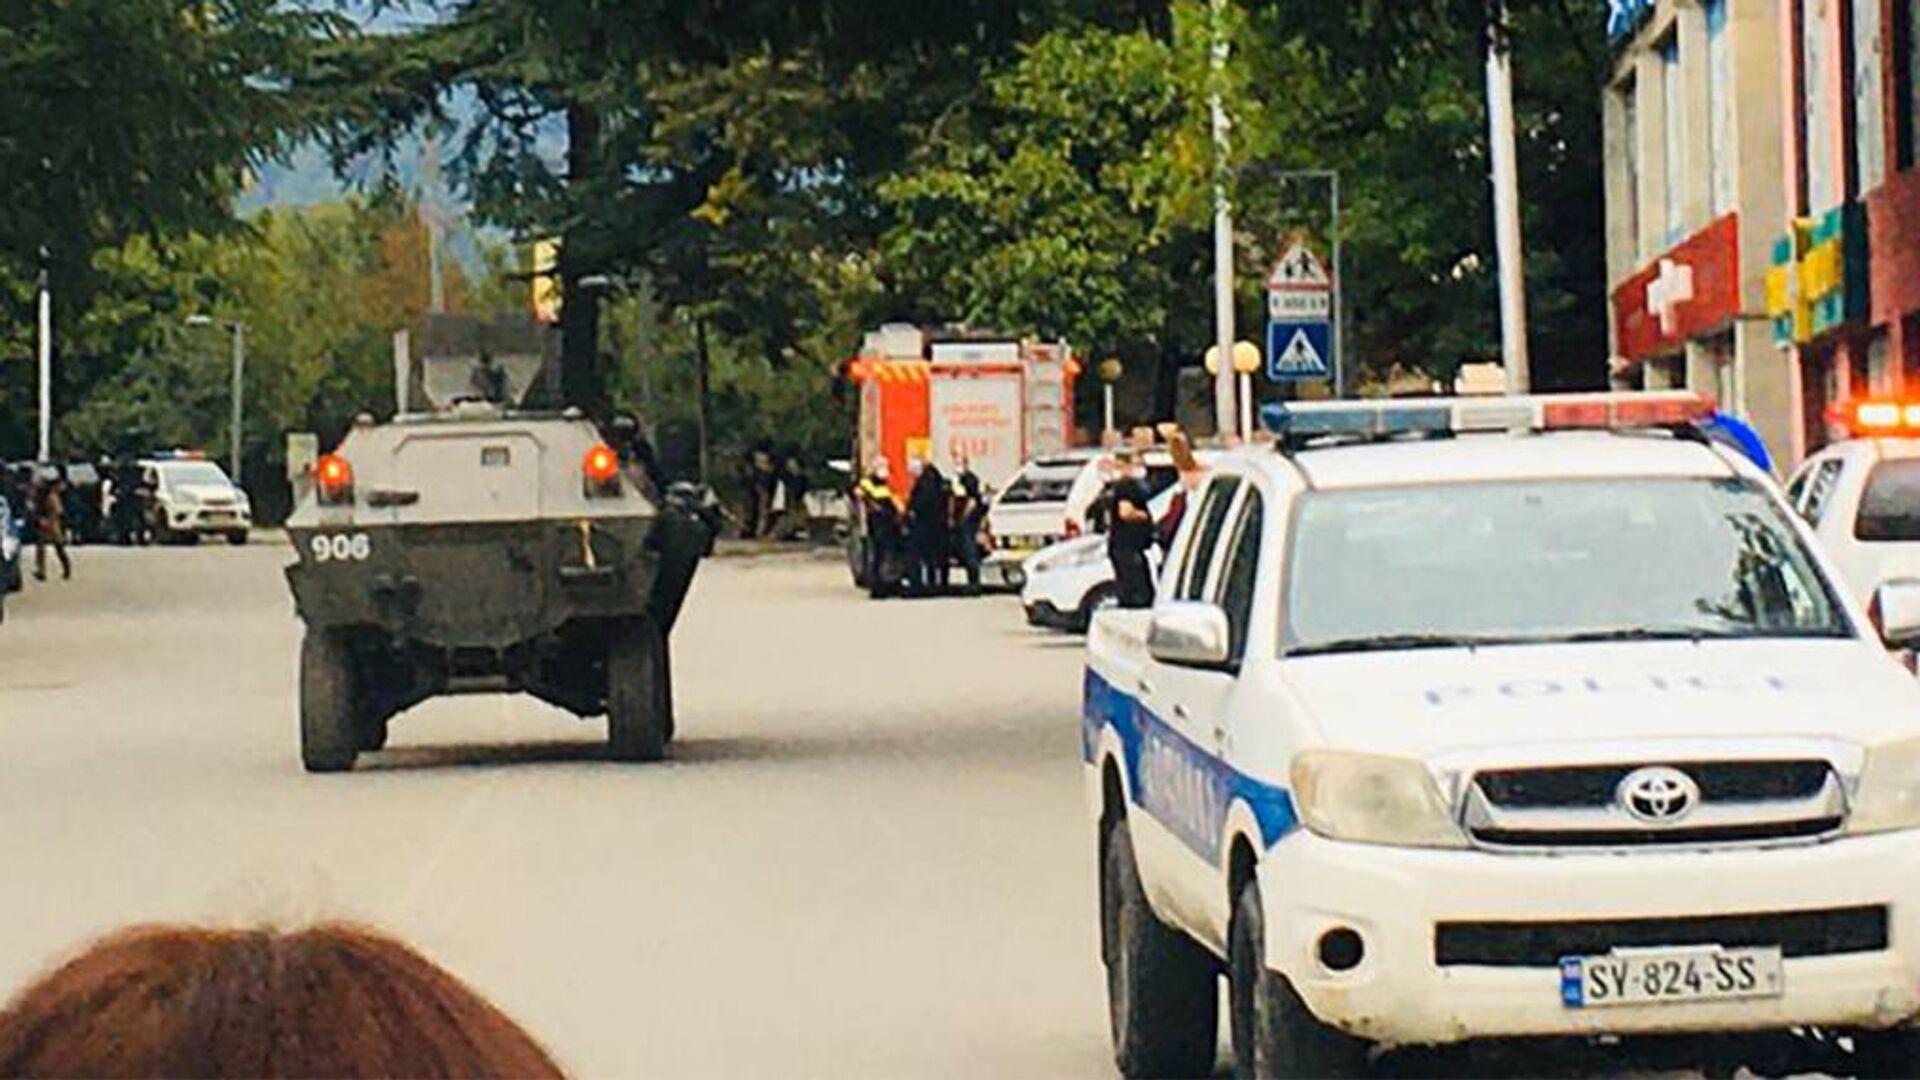 Полиция на месте нападения на филиал Банка Грузии в городе Кварели - Sputnik Грузия, 1920, 11.09.2021